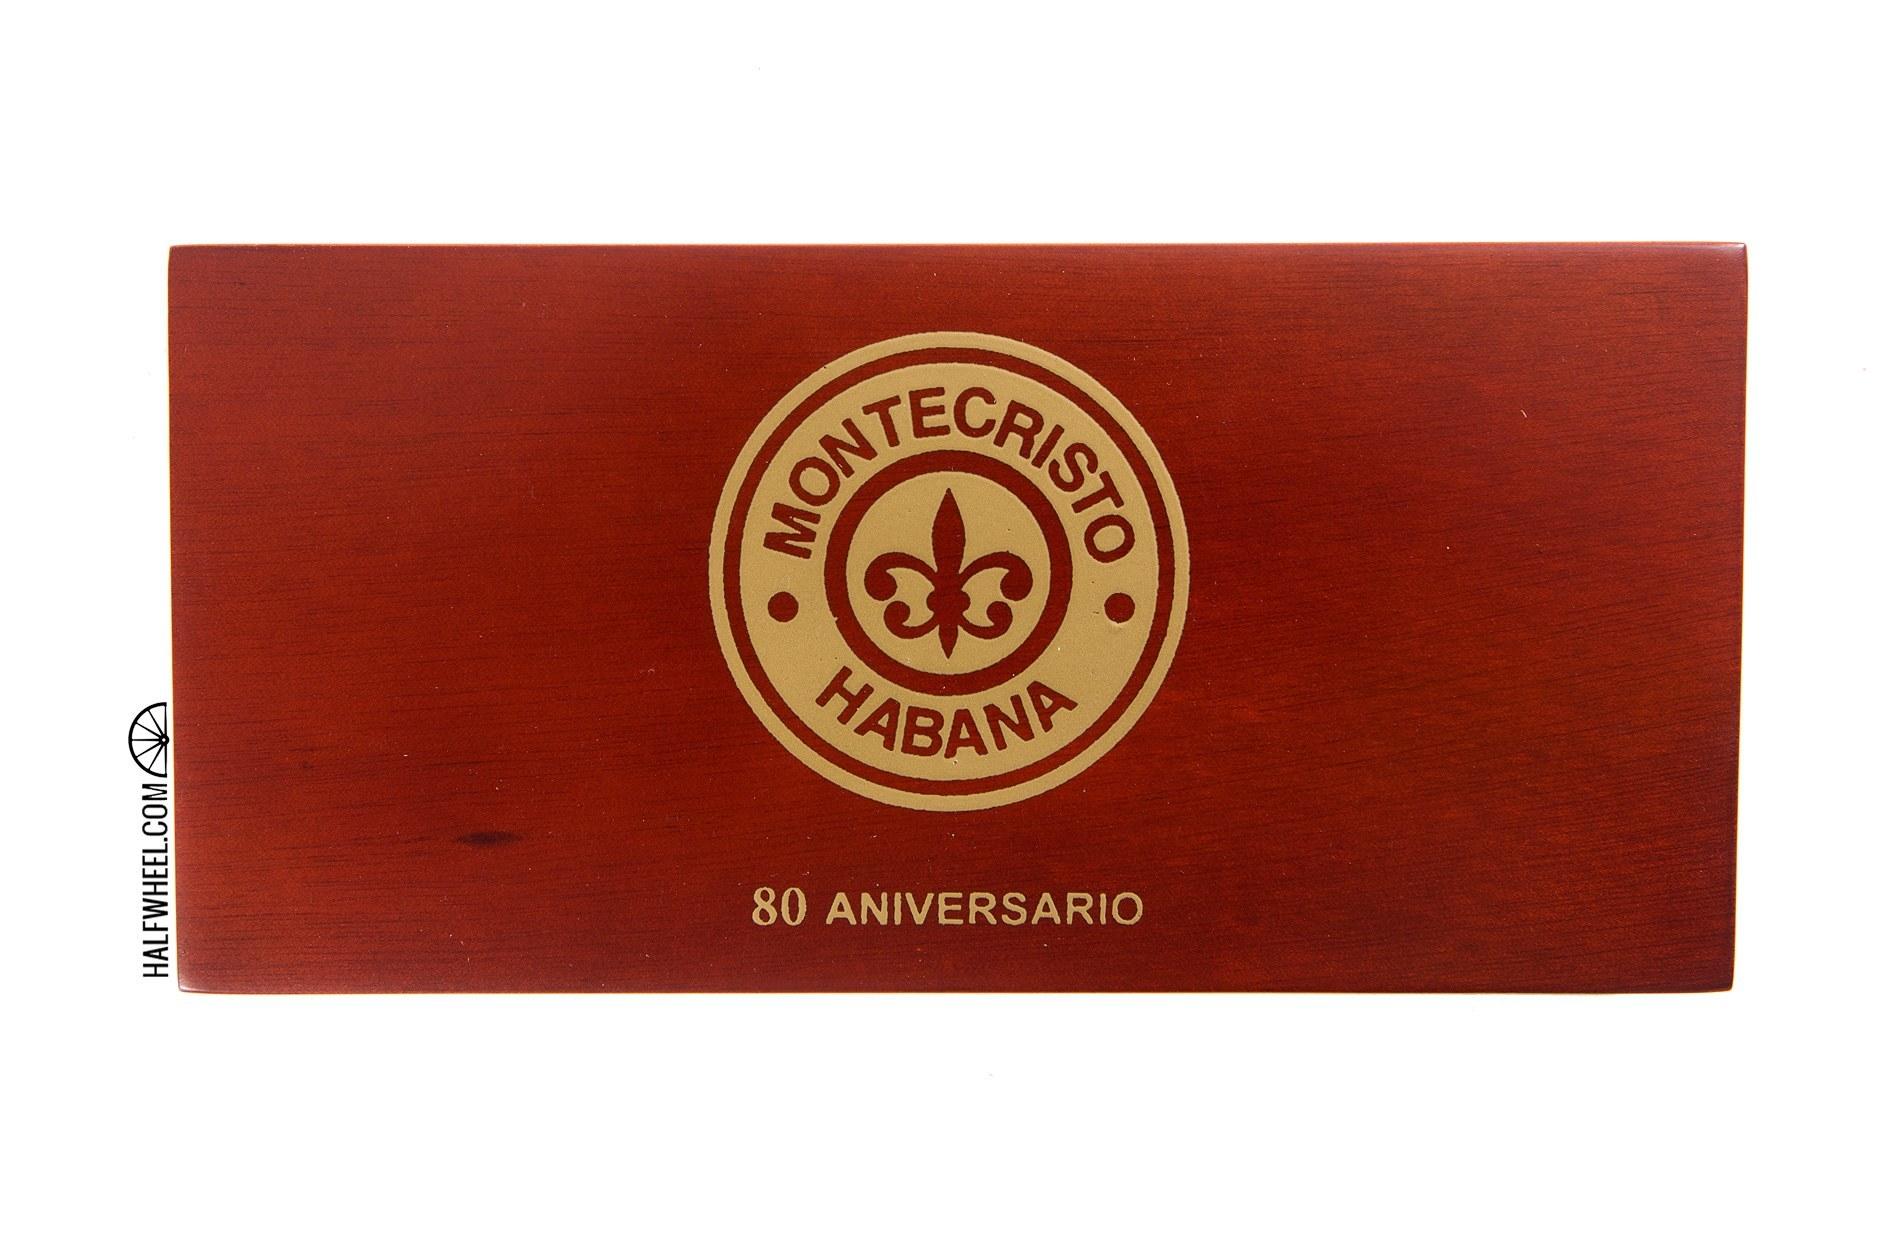 Montecristo 80 Aniversario Box 1